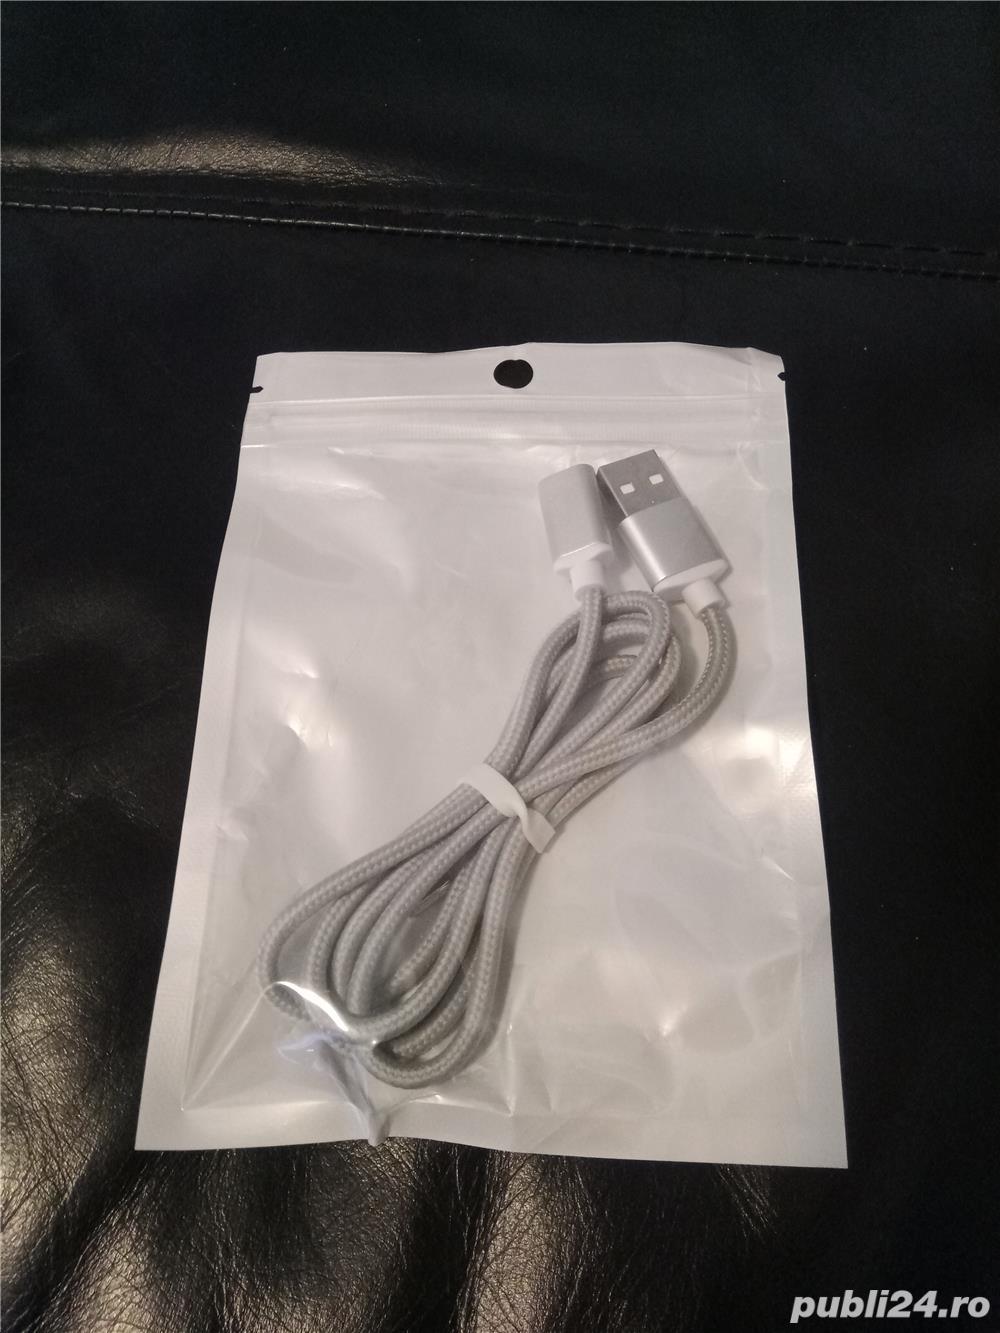 Cablu magnetic pentru Android cu insertie